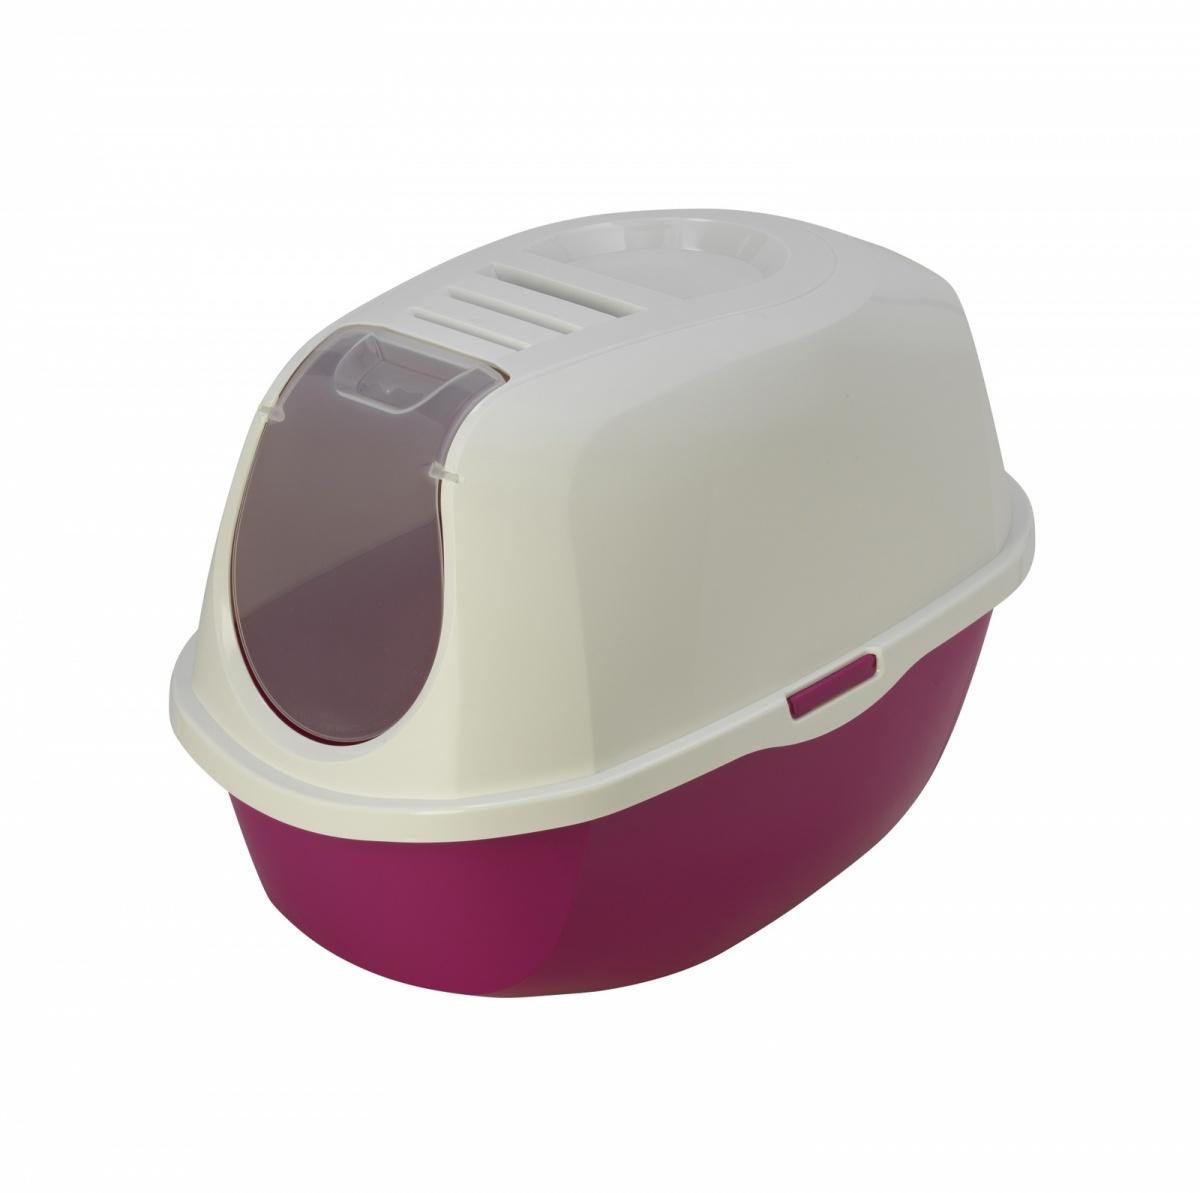 24647/C 370-328 MODERNA Smart Cat Туалет-домик для кошек 54х40х41 розовый